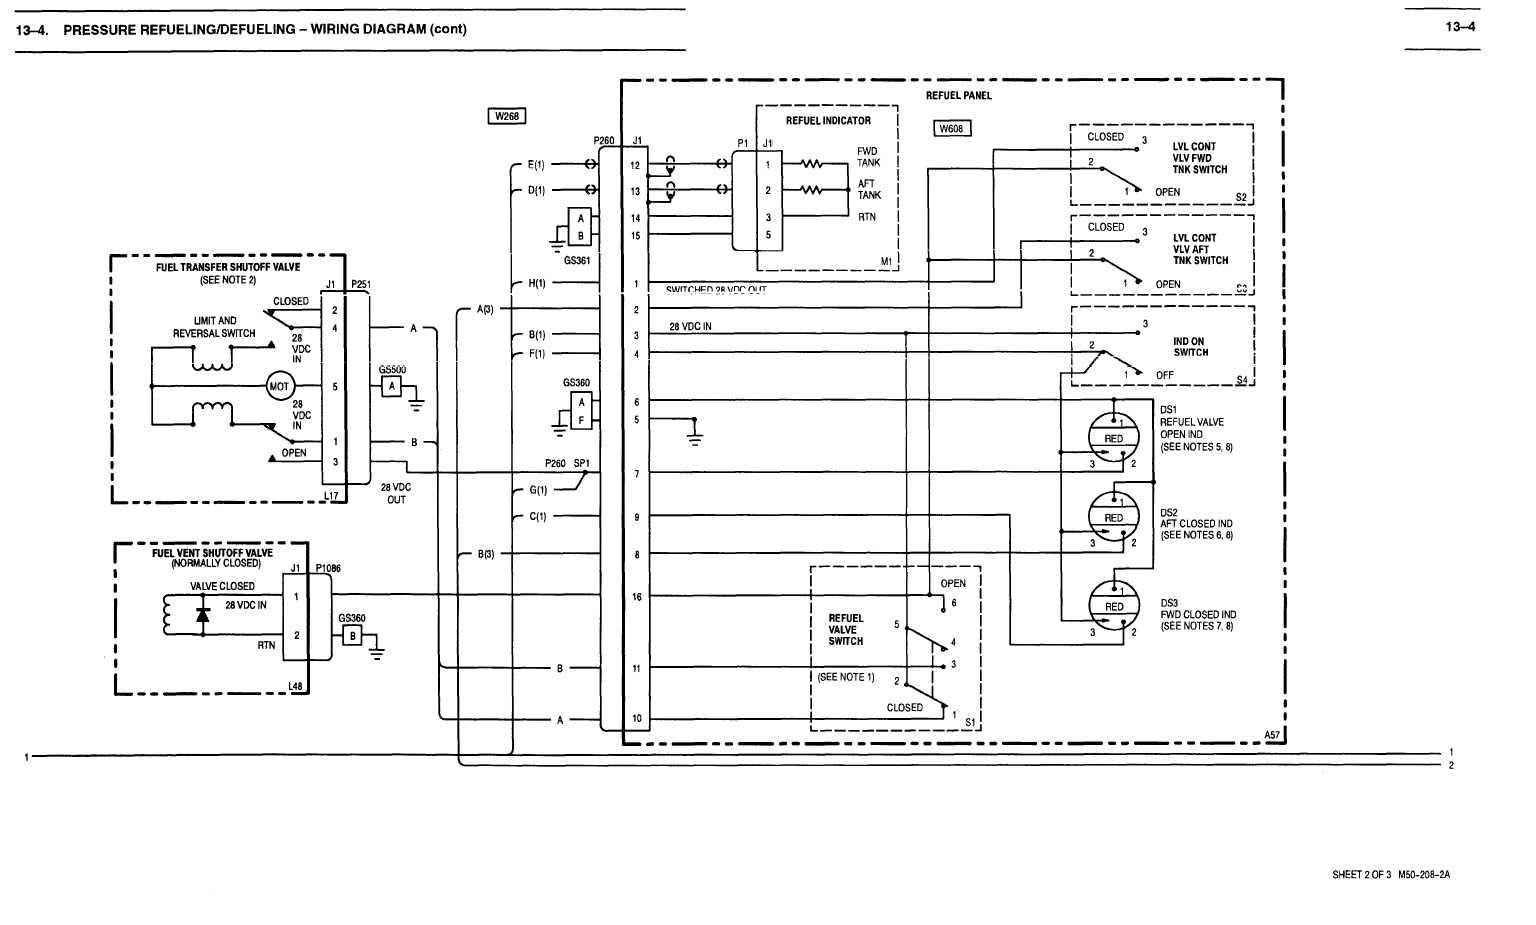 13 4 Pressure Refueling Defueling Wiring Diagram Cont